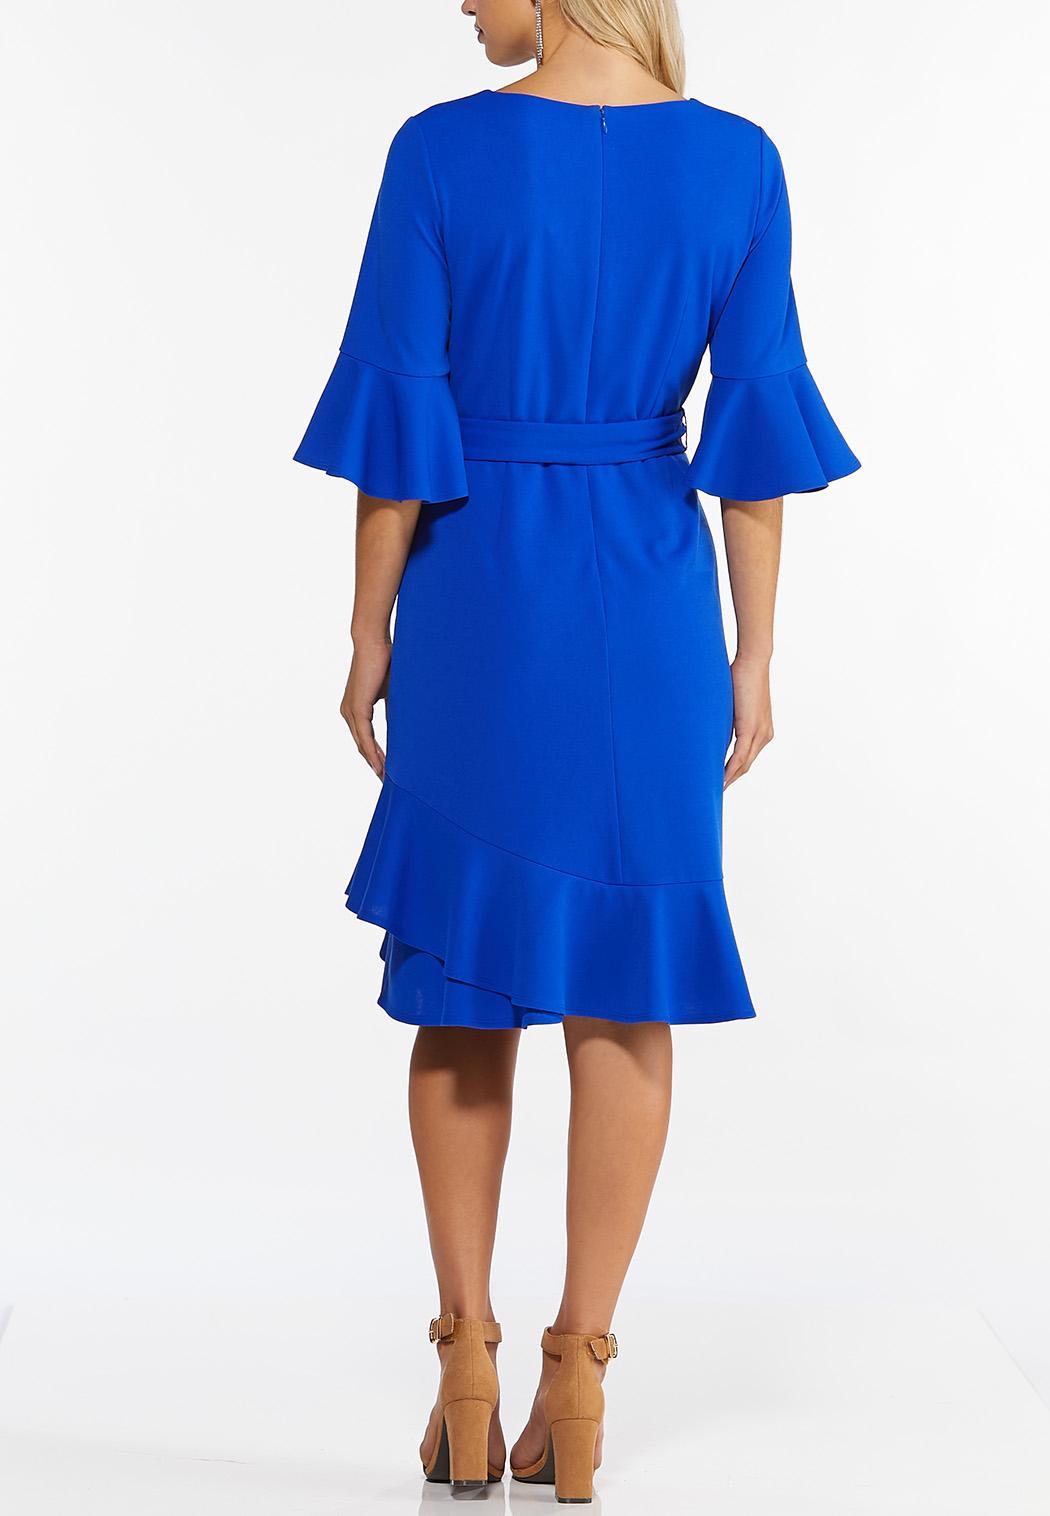 Plus Size Blue Ruffled Trim Dress (Item #44440427)